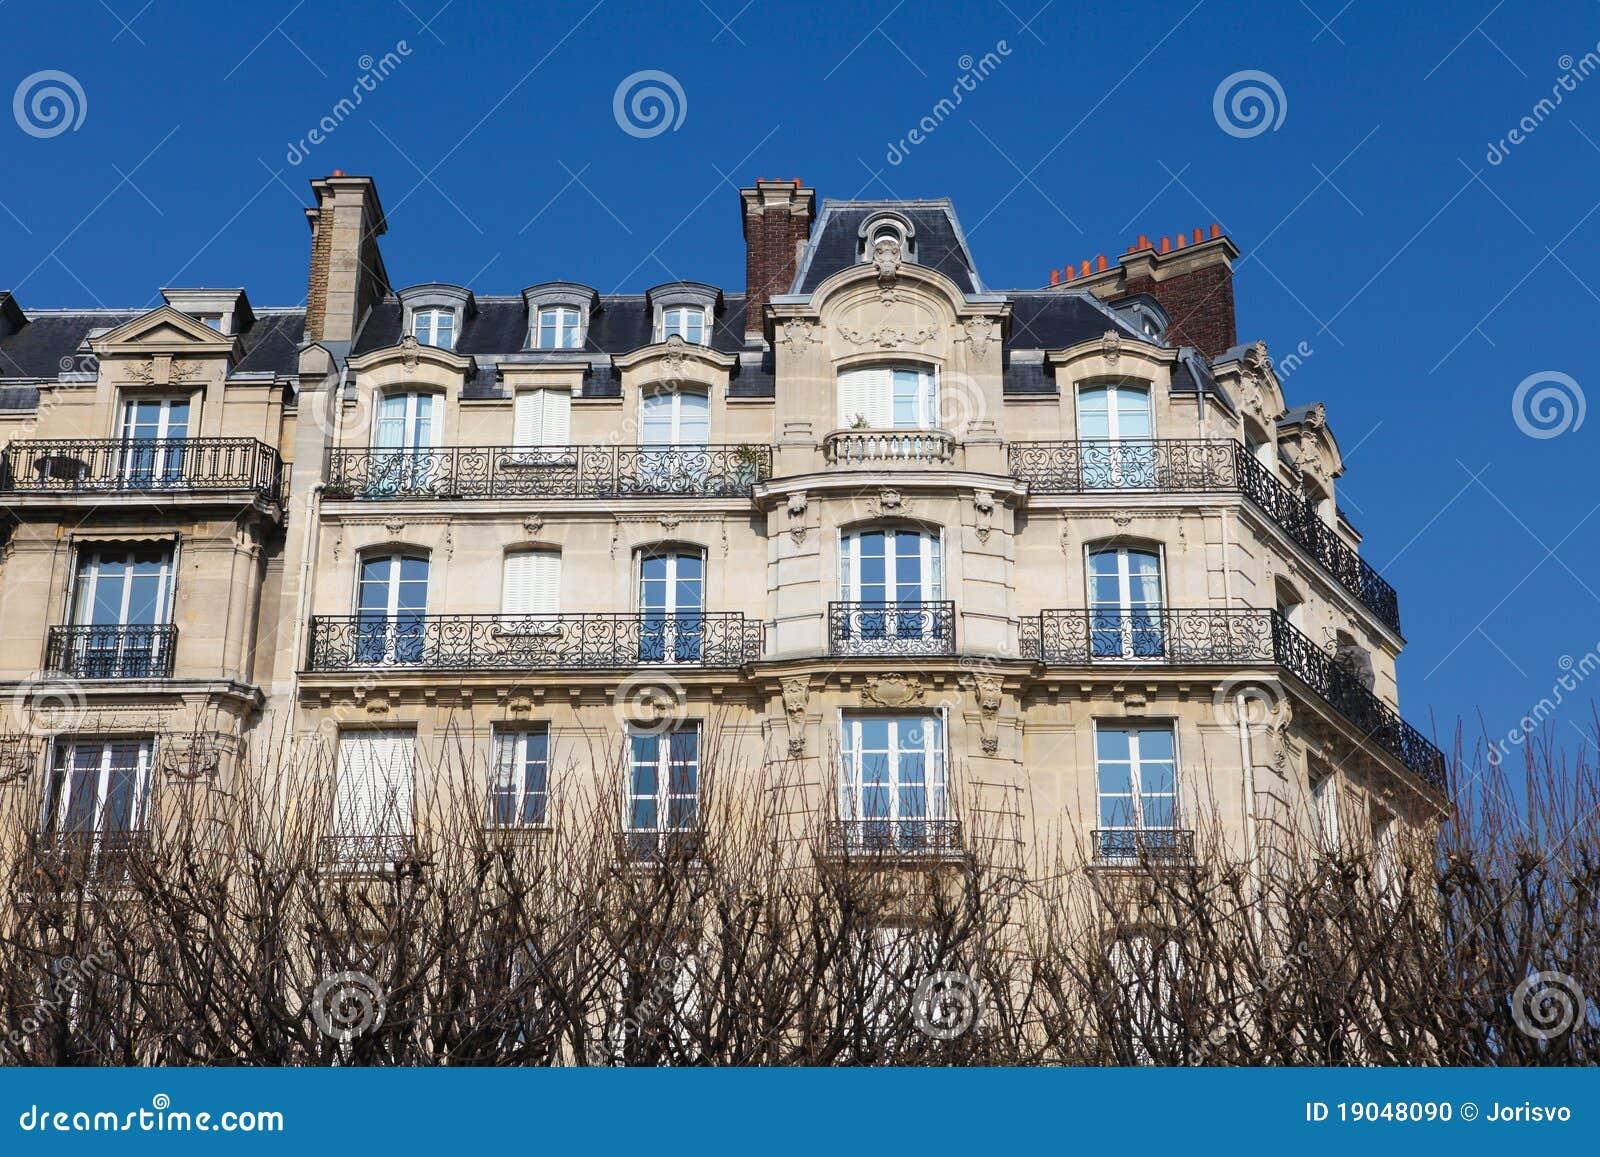 Parisian architecture stock photo image 19048090 for Architecture parisienne